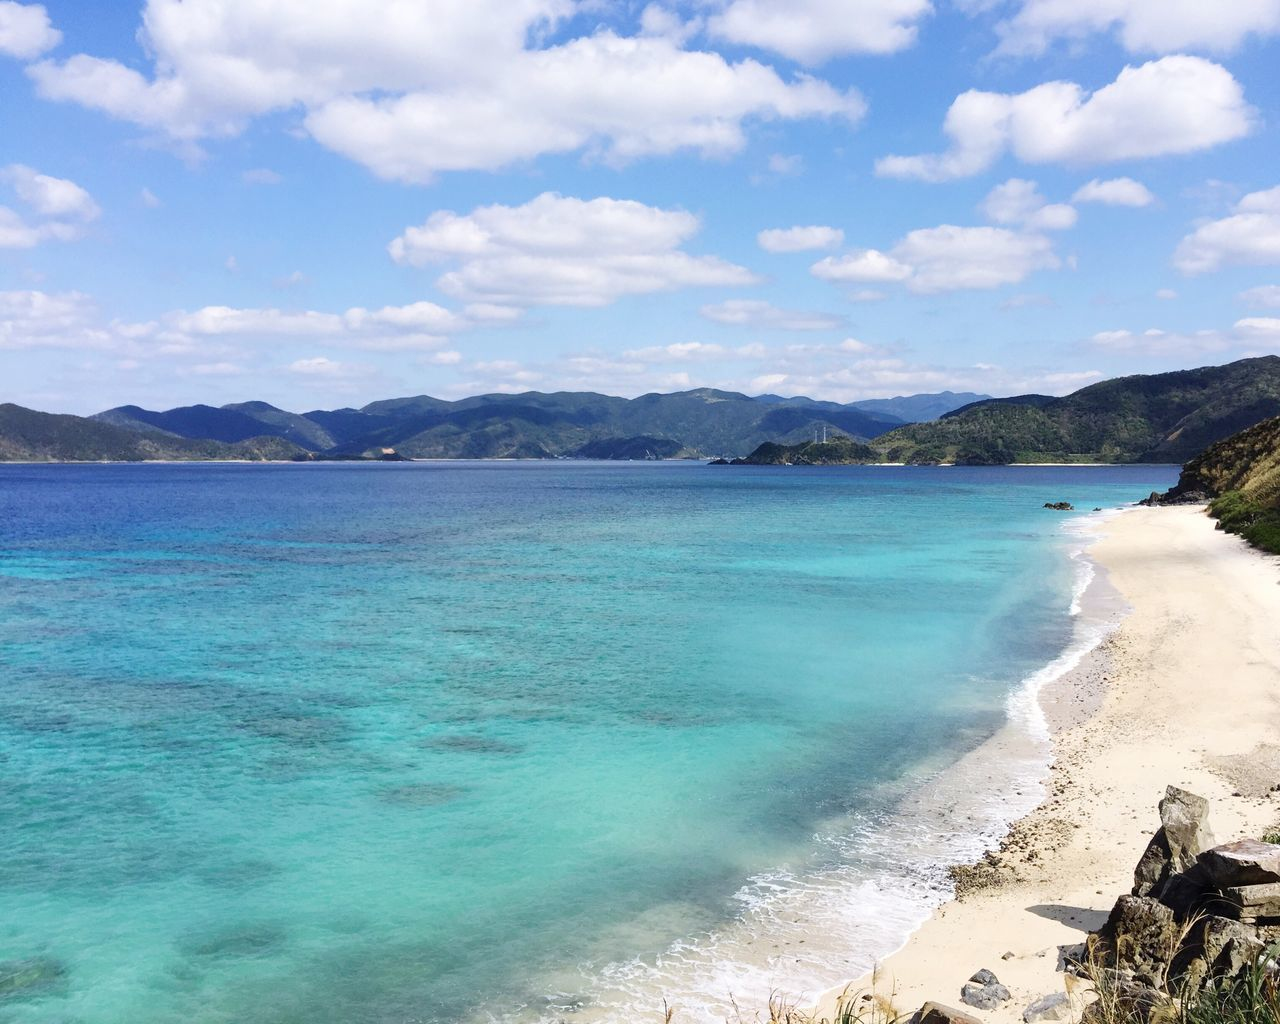 Sea Water Sky Scenics Beauty In Nature Beach Nature Coastline Tourism Cloud - Sky Travel Destinations Mountain Idyllic Outdoors No People Day Turquoise Kagoshima Amami Island